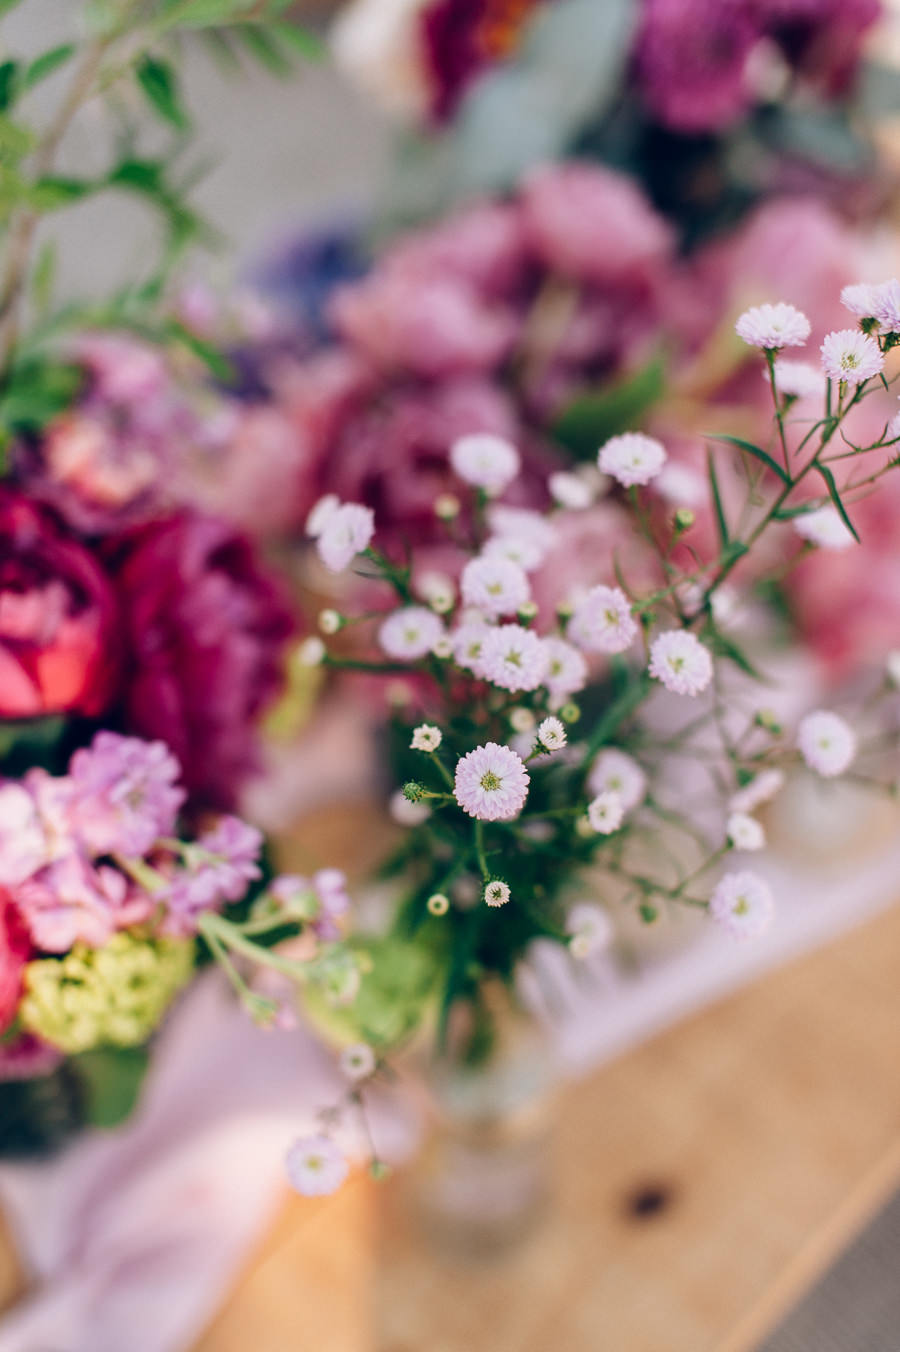 Flores para decorar tipis chill out 13